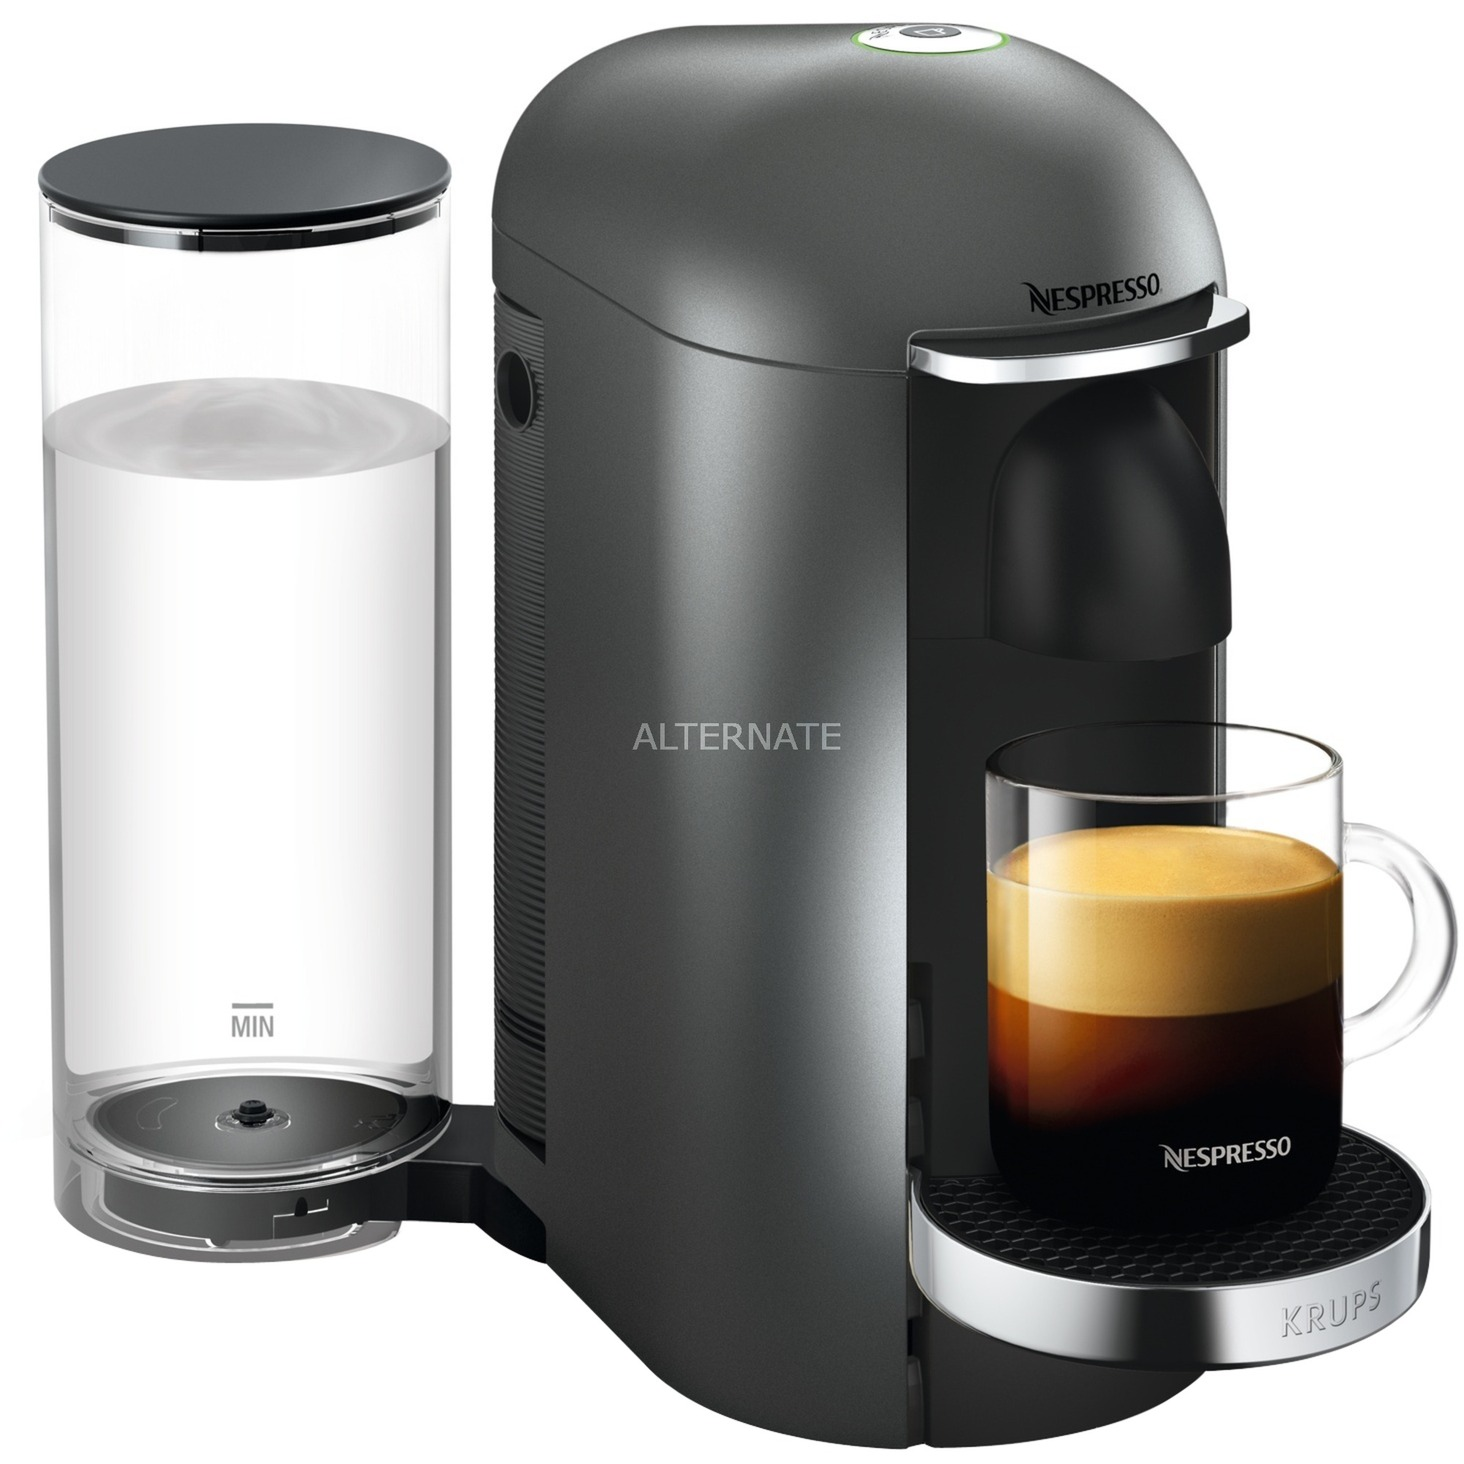 Evidence XN900T Independiente Máquina de café en cápsulas Negro 1,7 L Semi-automática, Cafetera de cápsulas